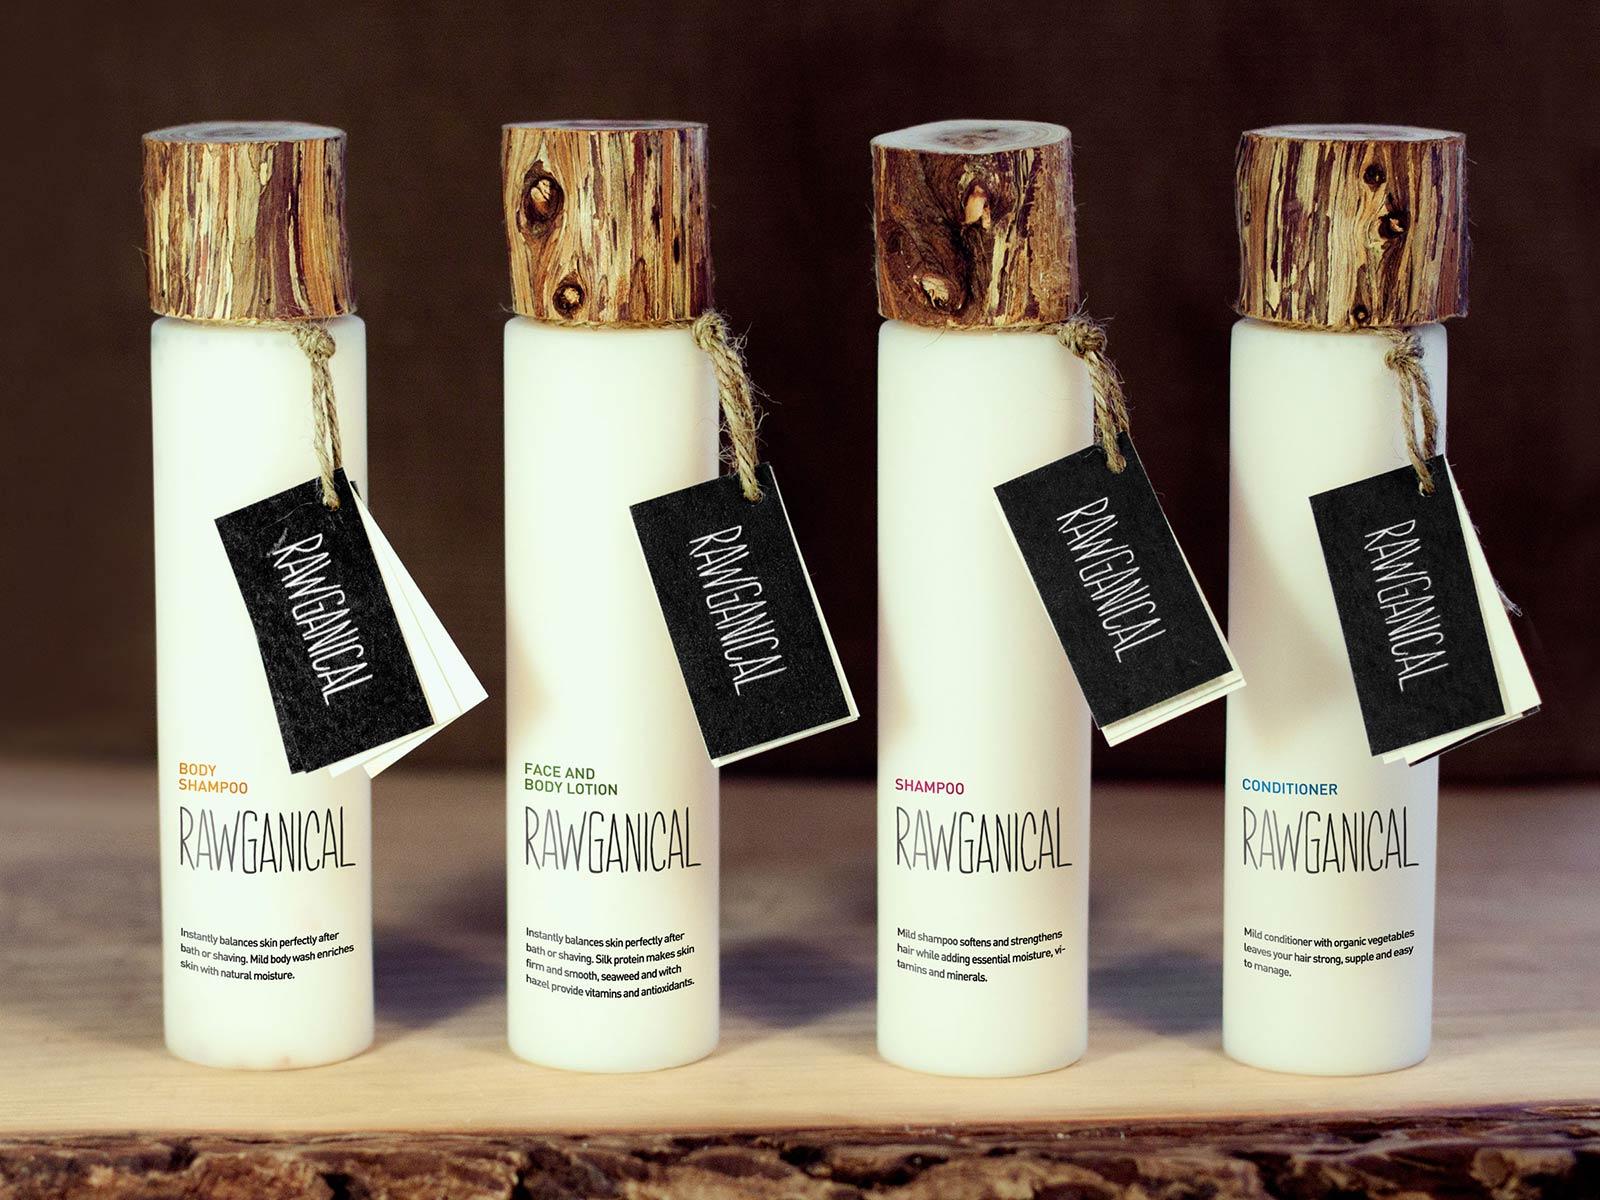 Rawganical packaging